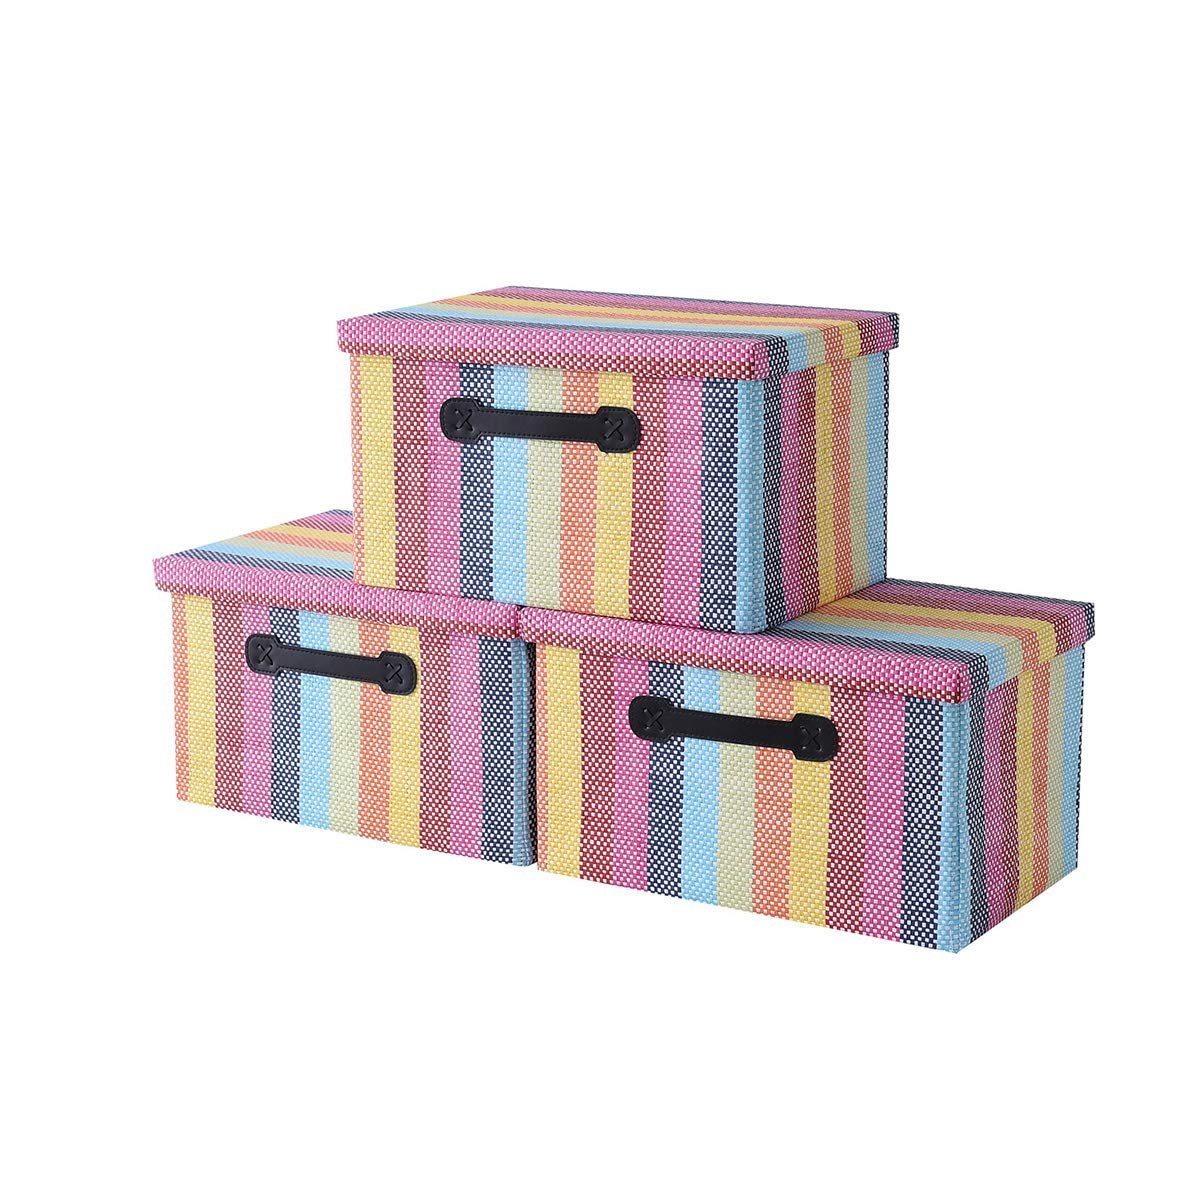 Jtirey Storage Boxes 3-Pack Fabric Bins Save money Lid Max 80% OFF Organiz with